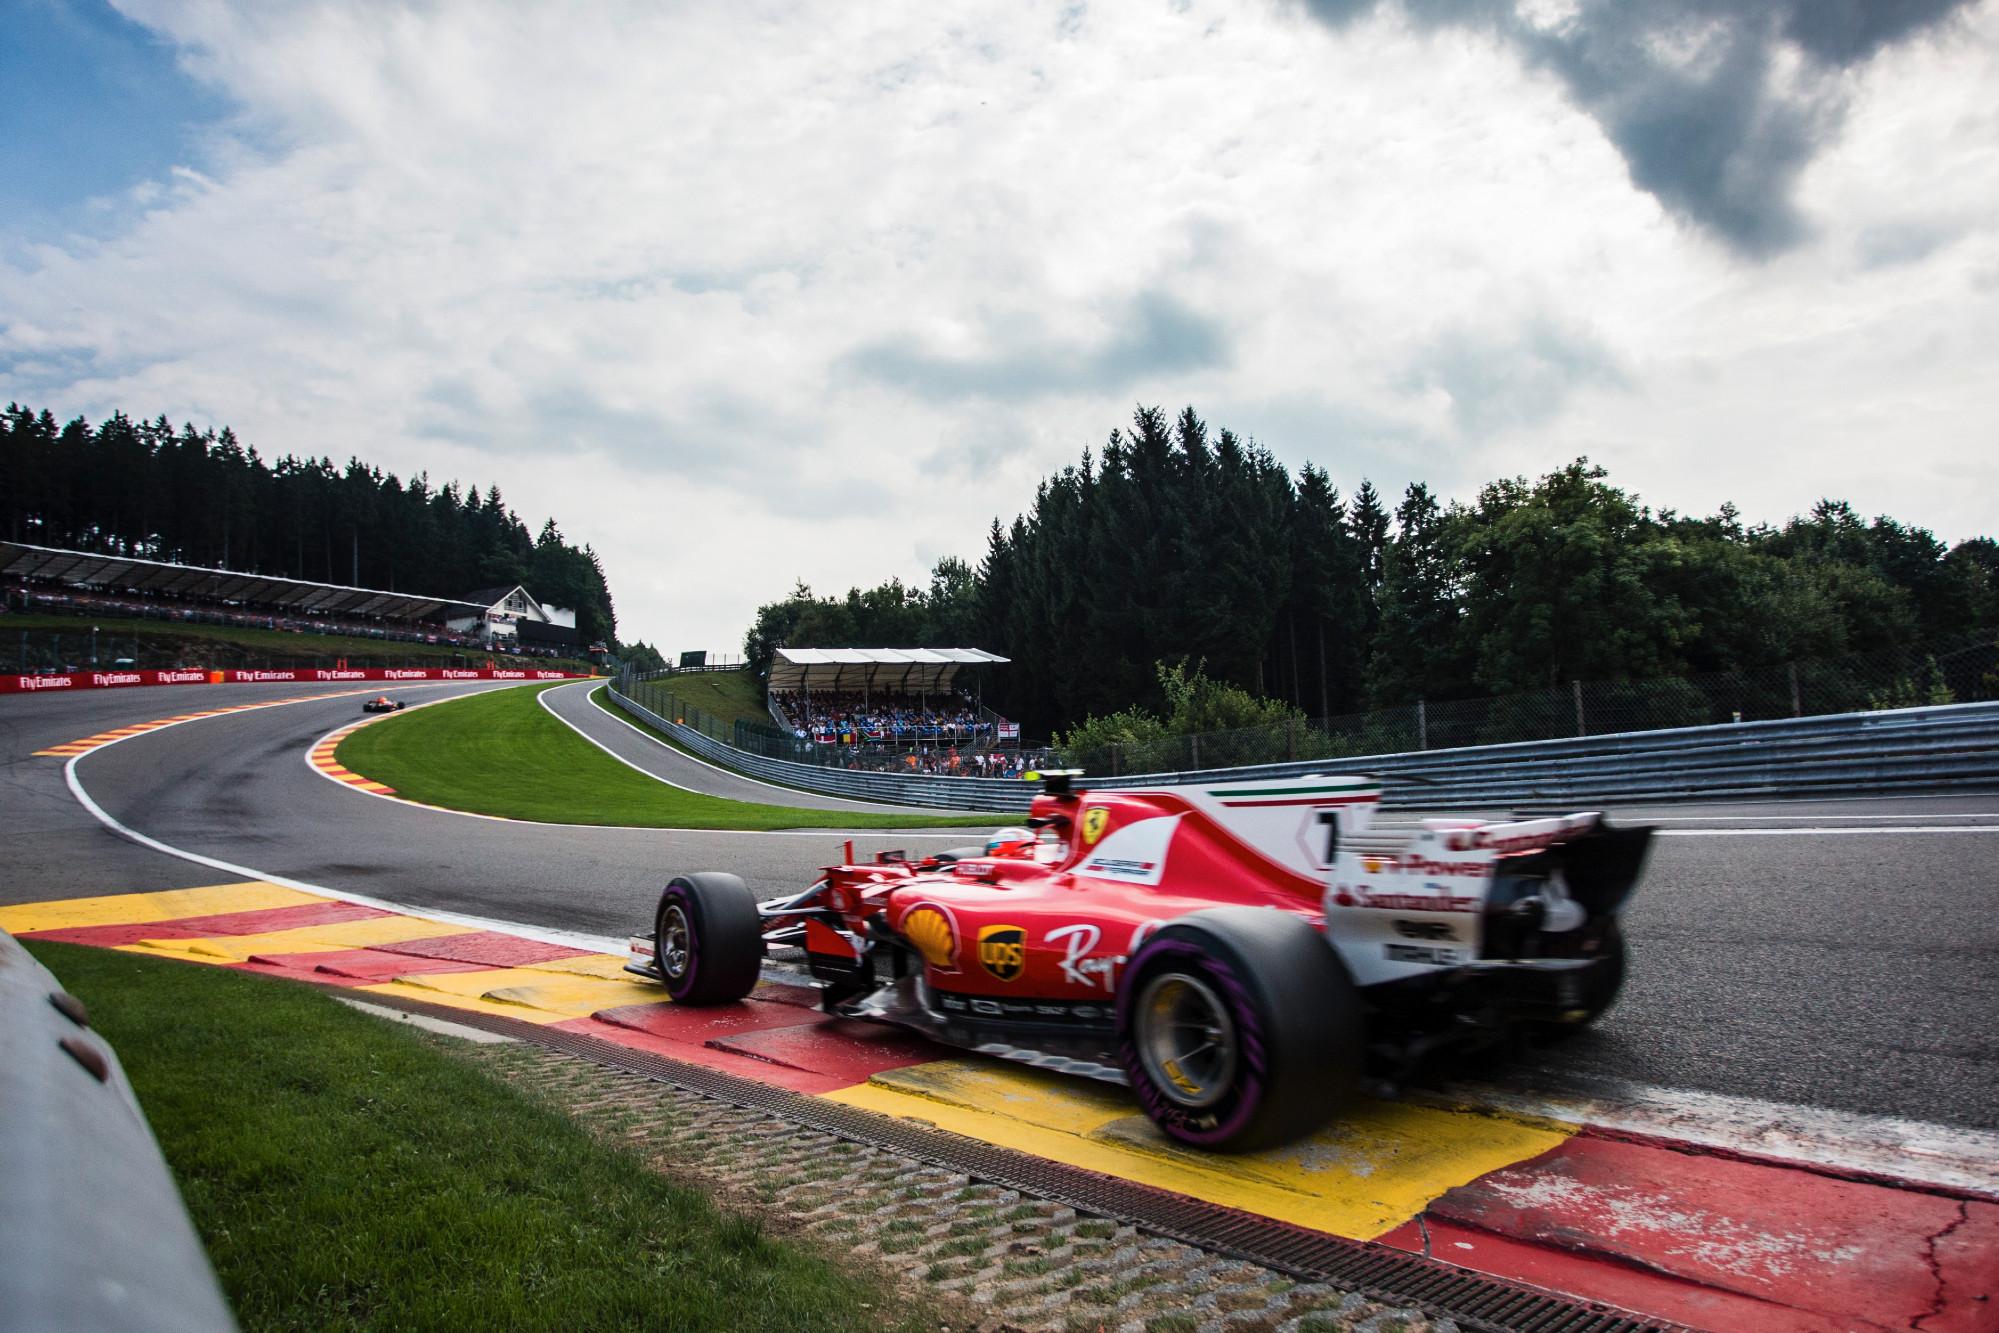 Kimi Raikkonen, Belgian GP 2017